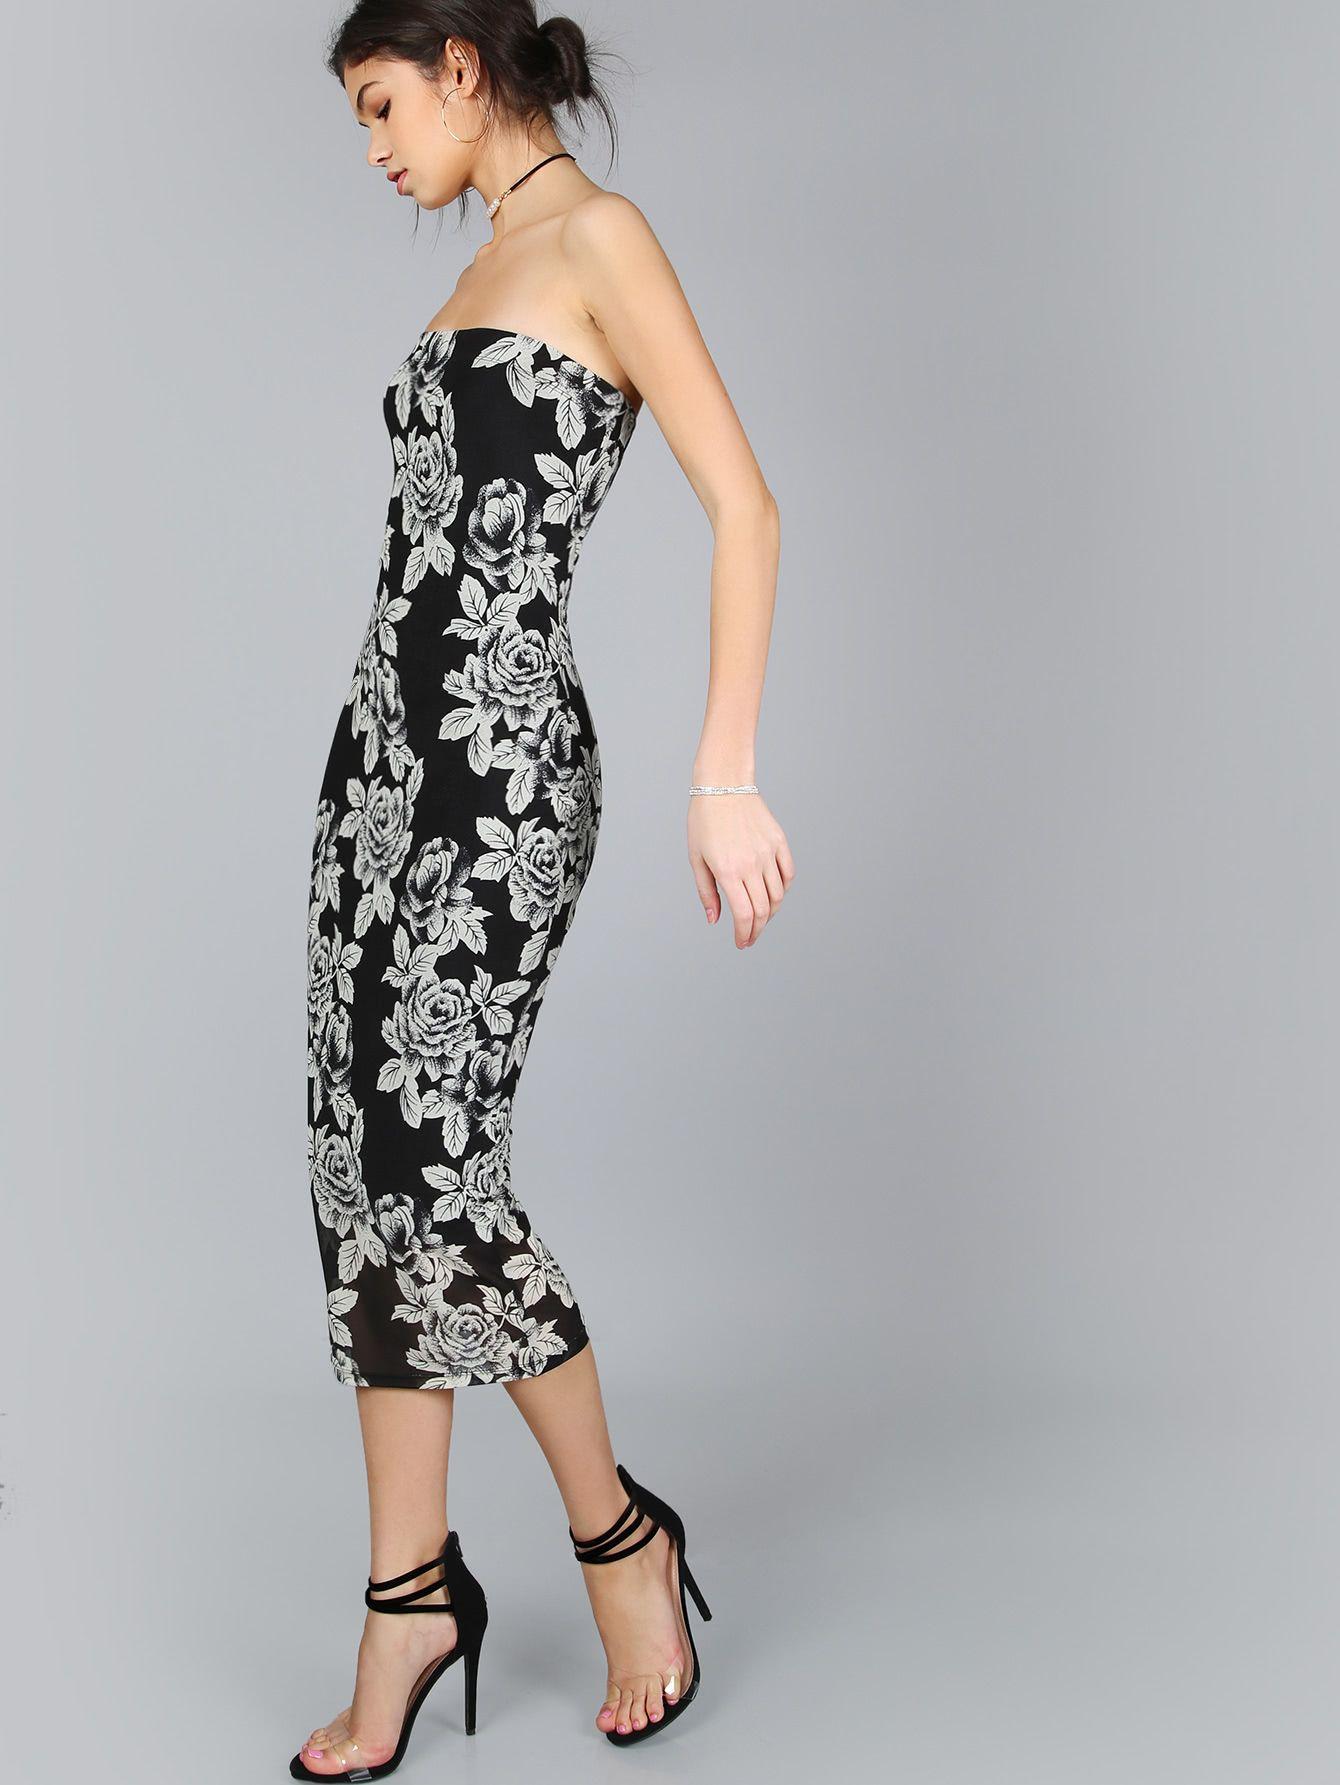 bd191ef15b Shop Floral Print Bandeau Dress online. SheIn offers Floral Print Bandeau  Dress & more to fit your fashionable needs.